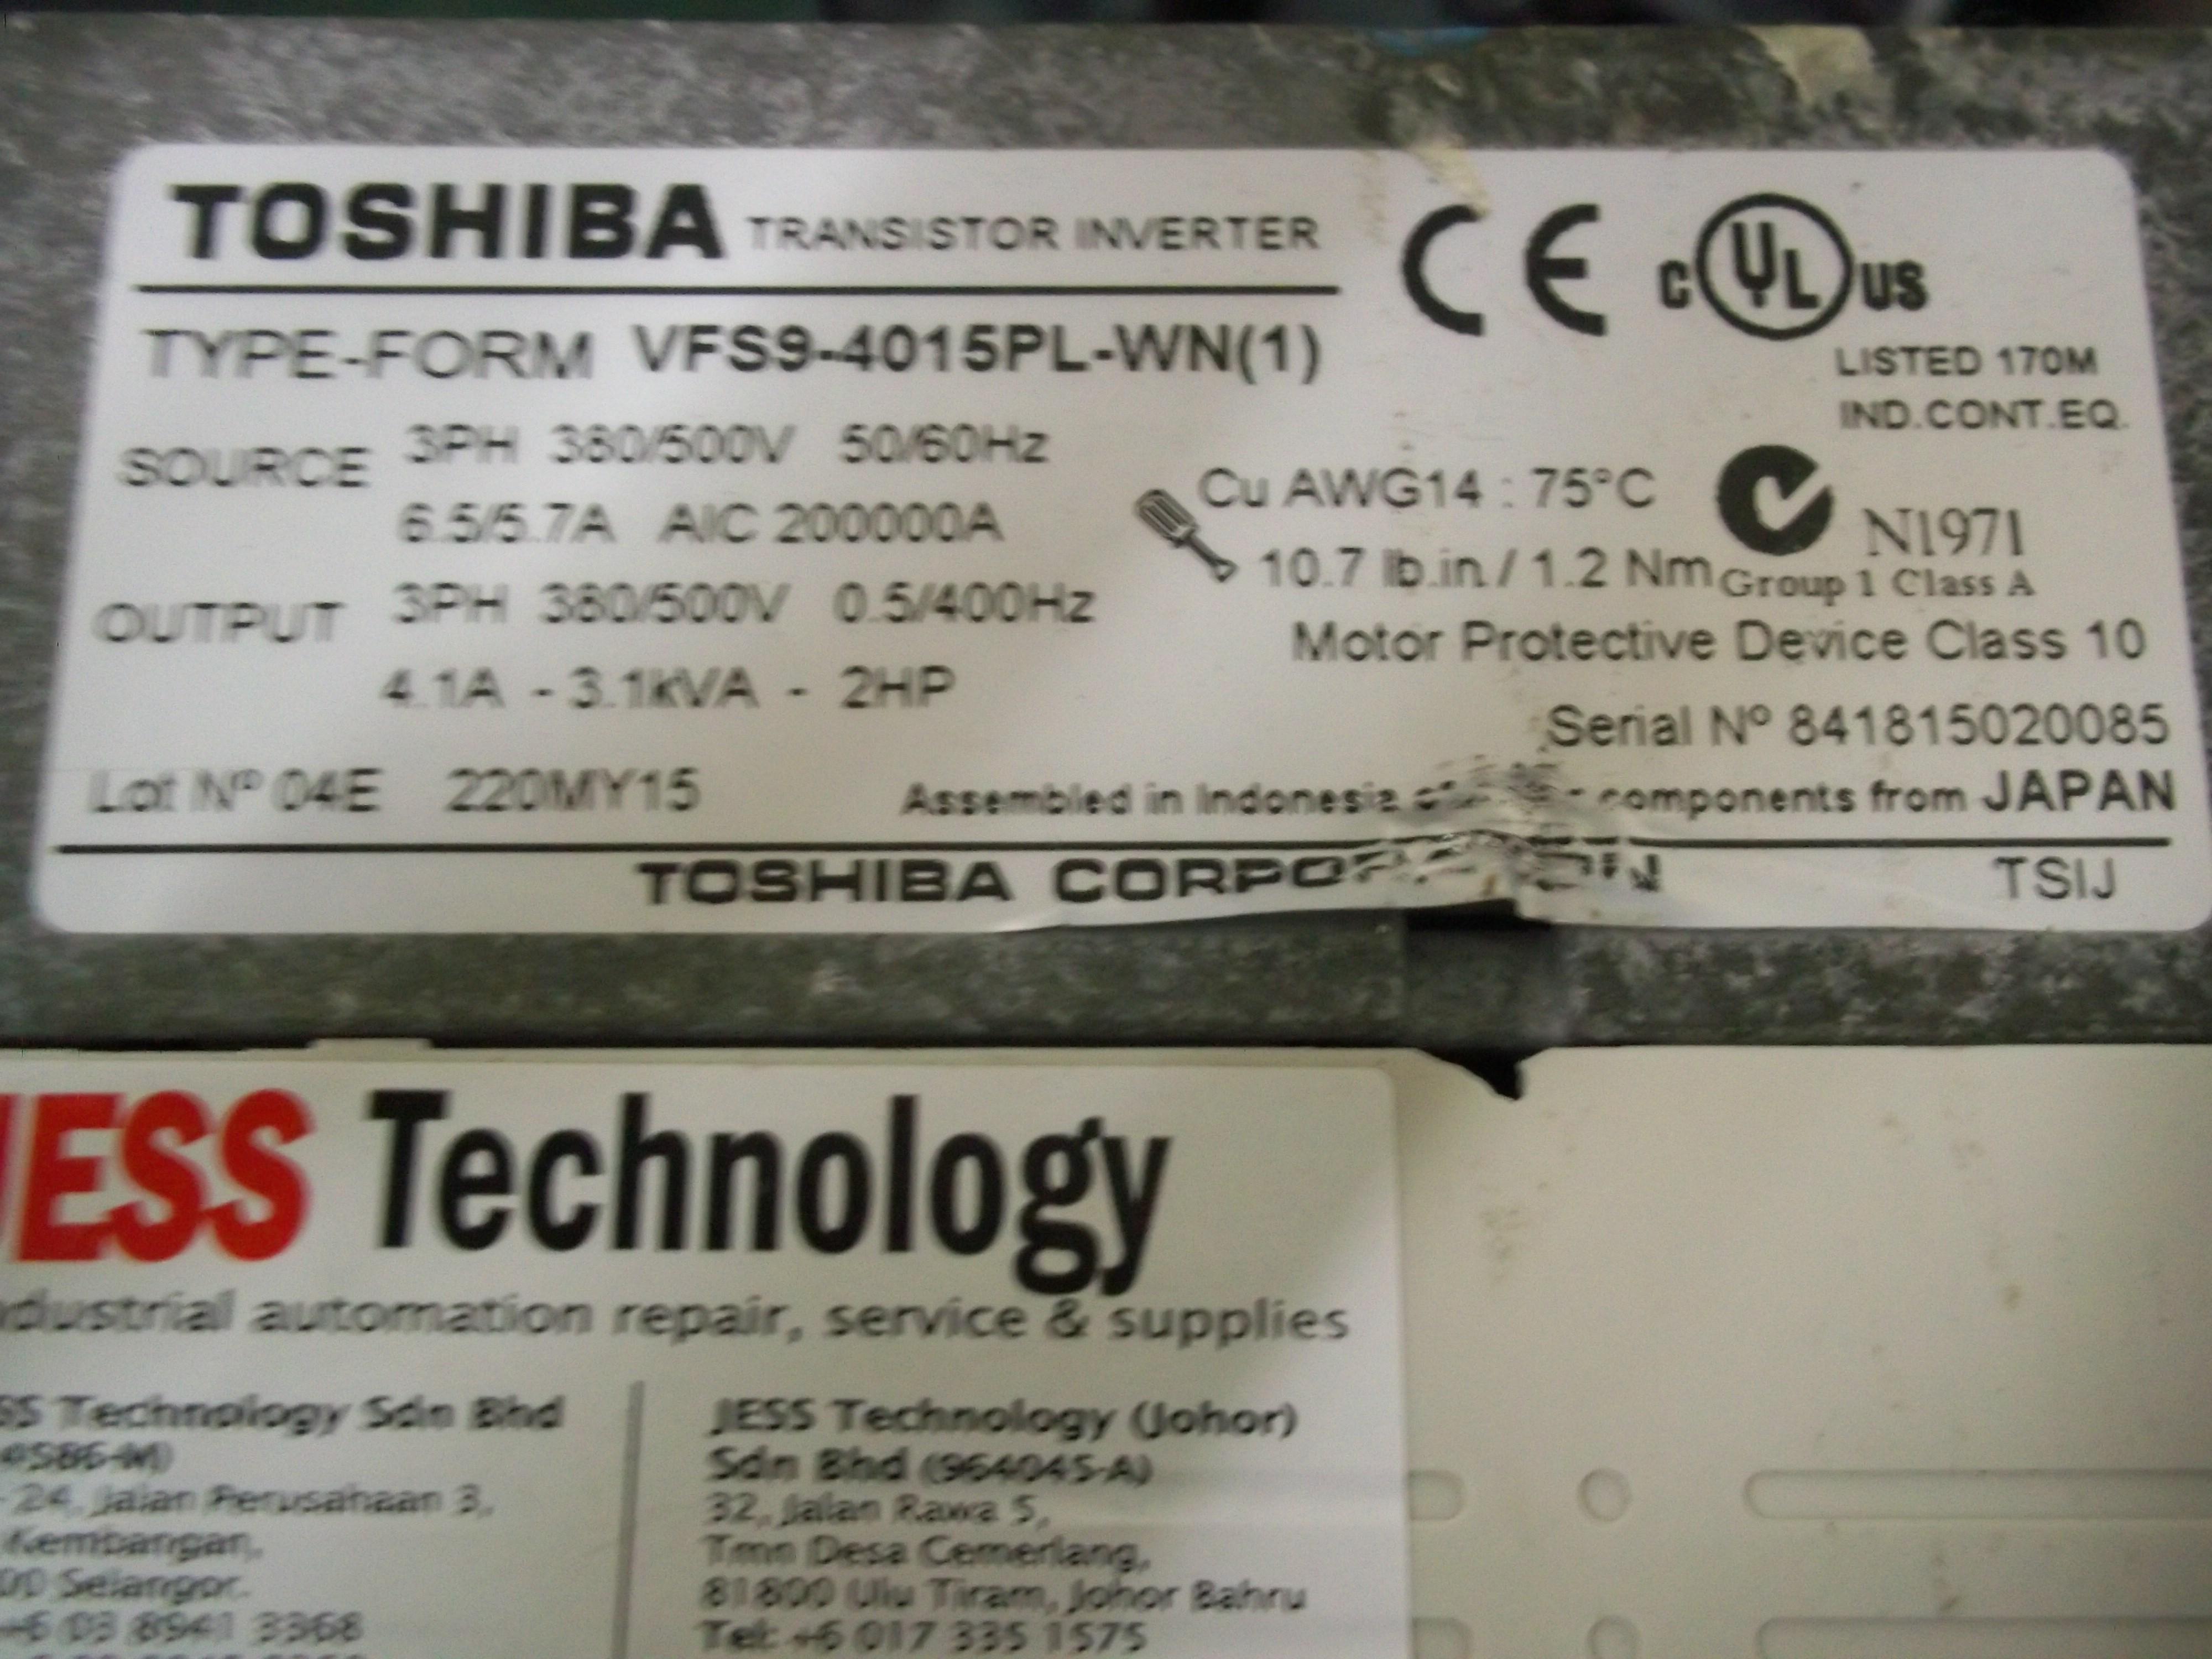 Repair VFS9-4015PL-WN(1) TOSHIBA TOSHIBA TRANSISTOR INVERETER in Malaysia, Singapore, Thailand, Indonesia